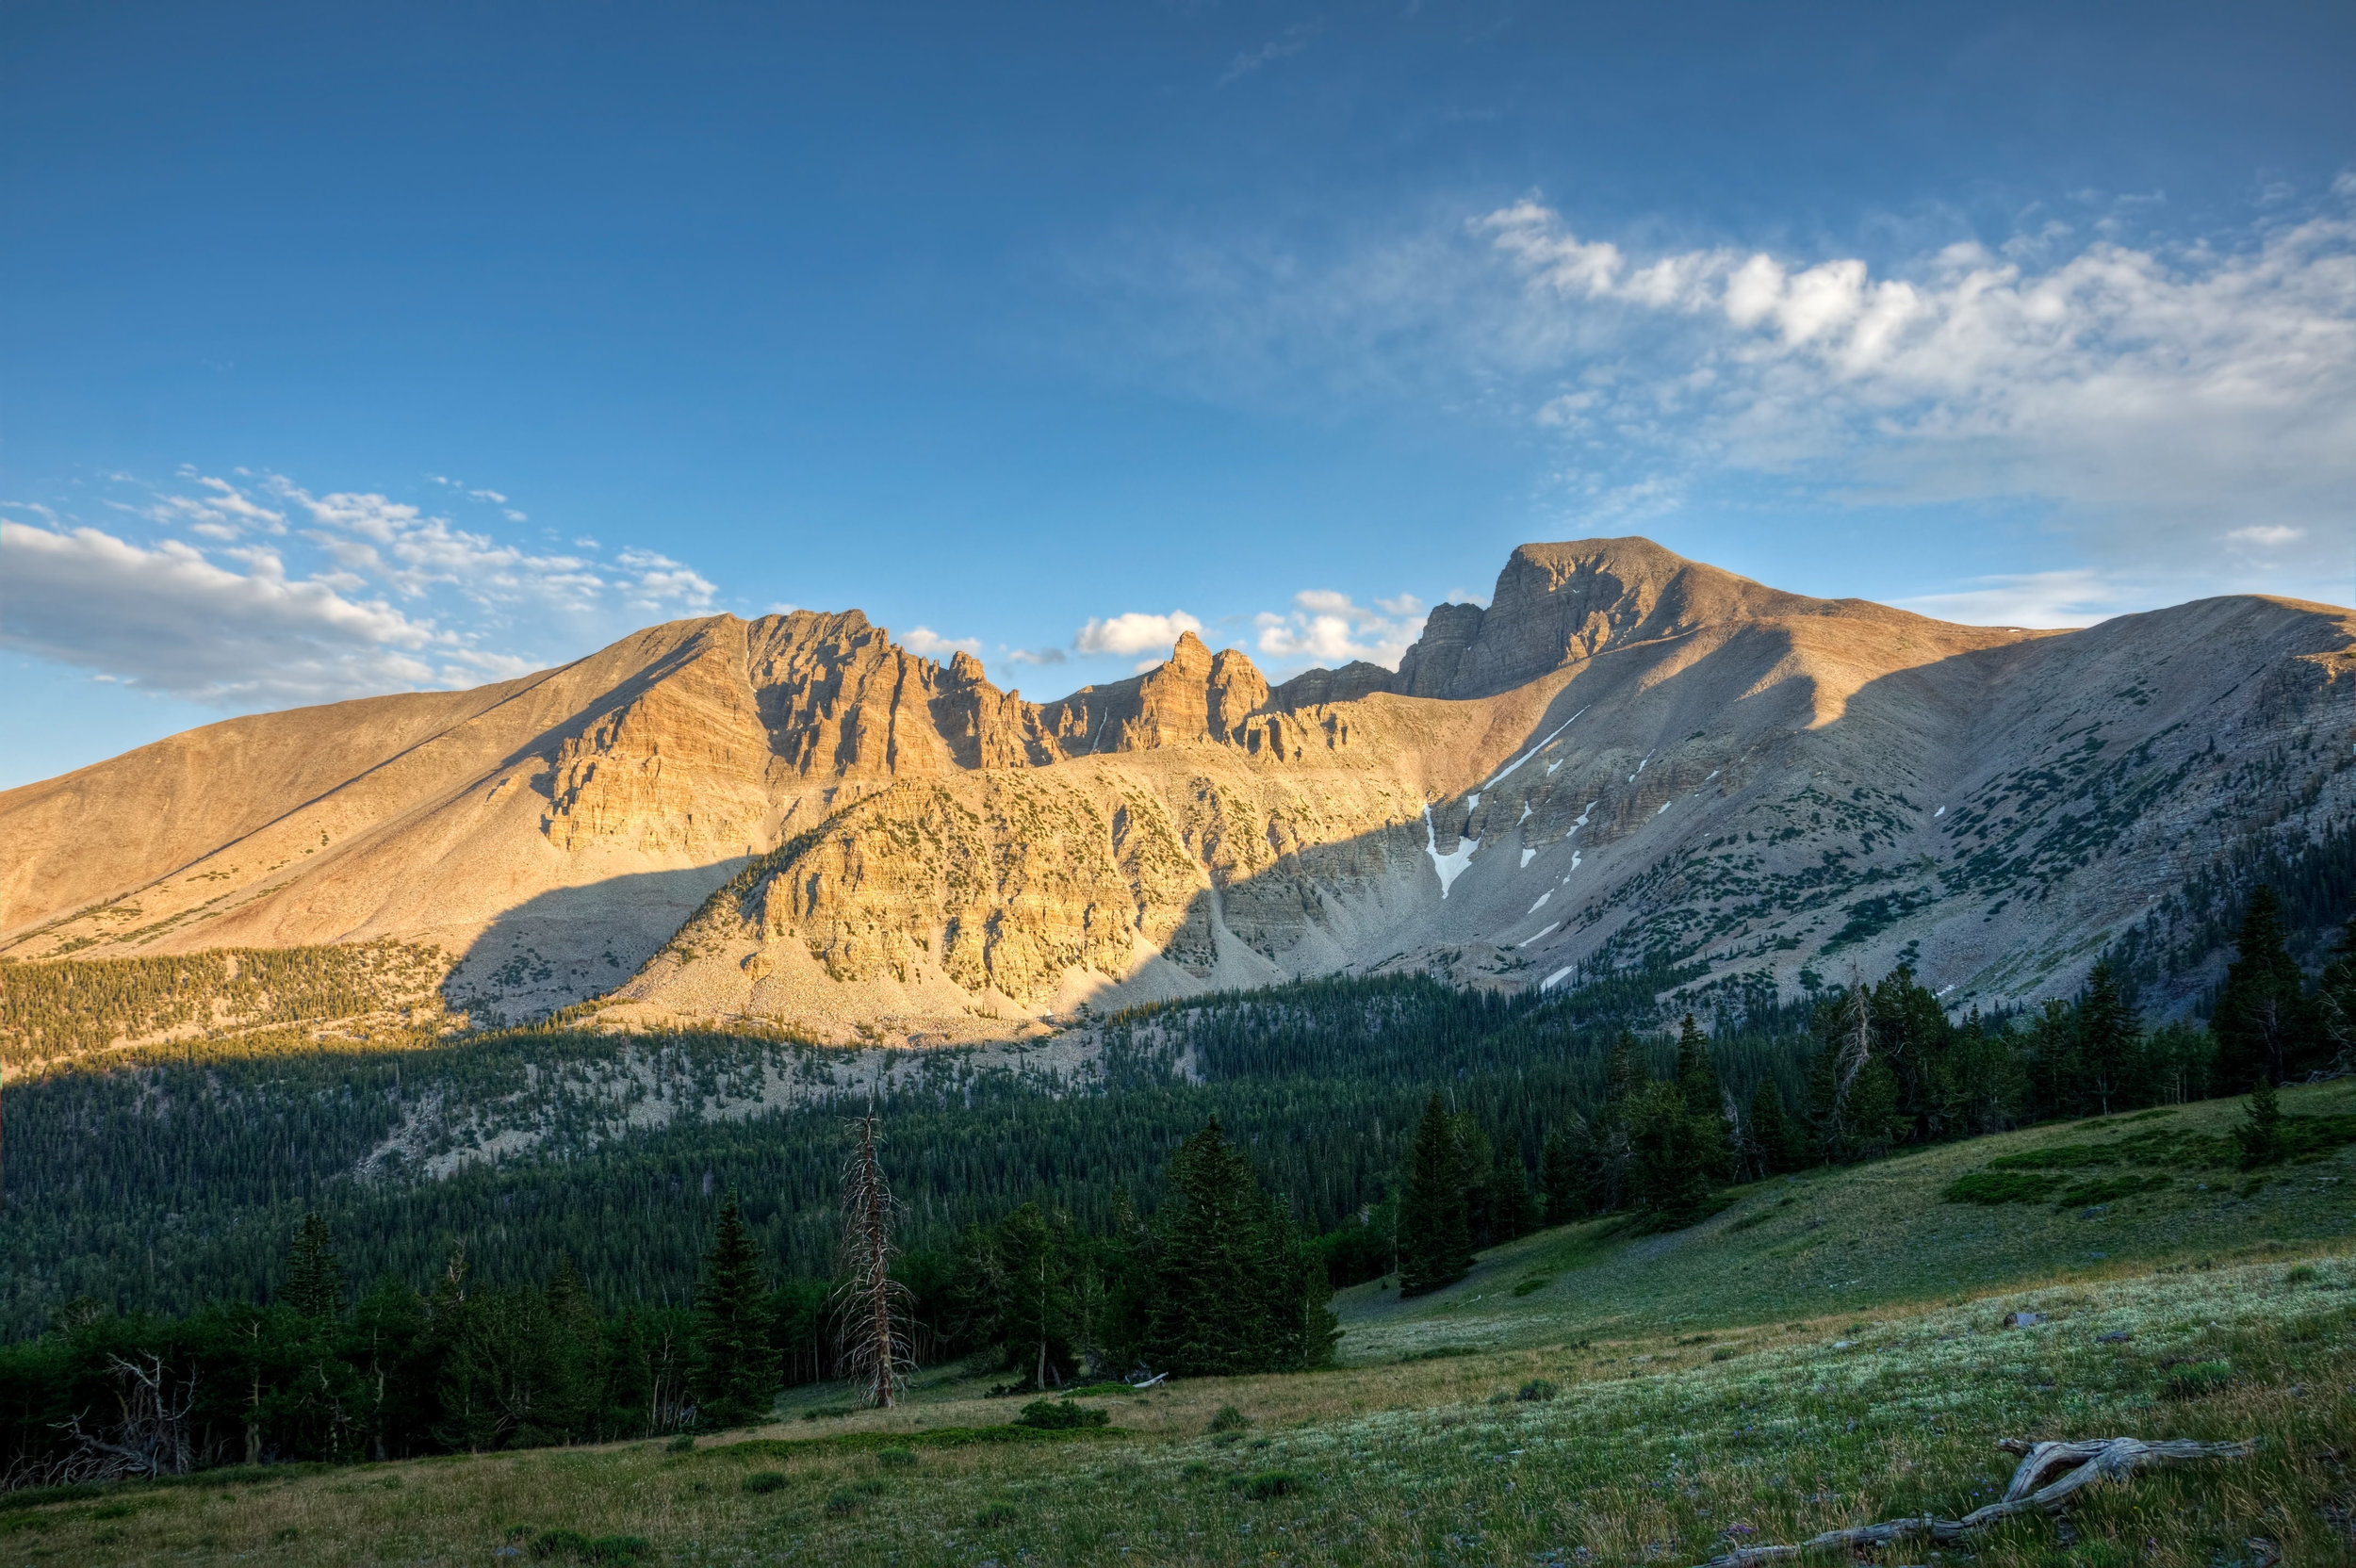 Wheeler Peak Stands Over Great Basin National Park –(PHOTO:Jeffrey T. Kreulen/SHUTTERSTOCK)